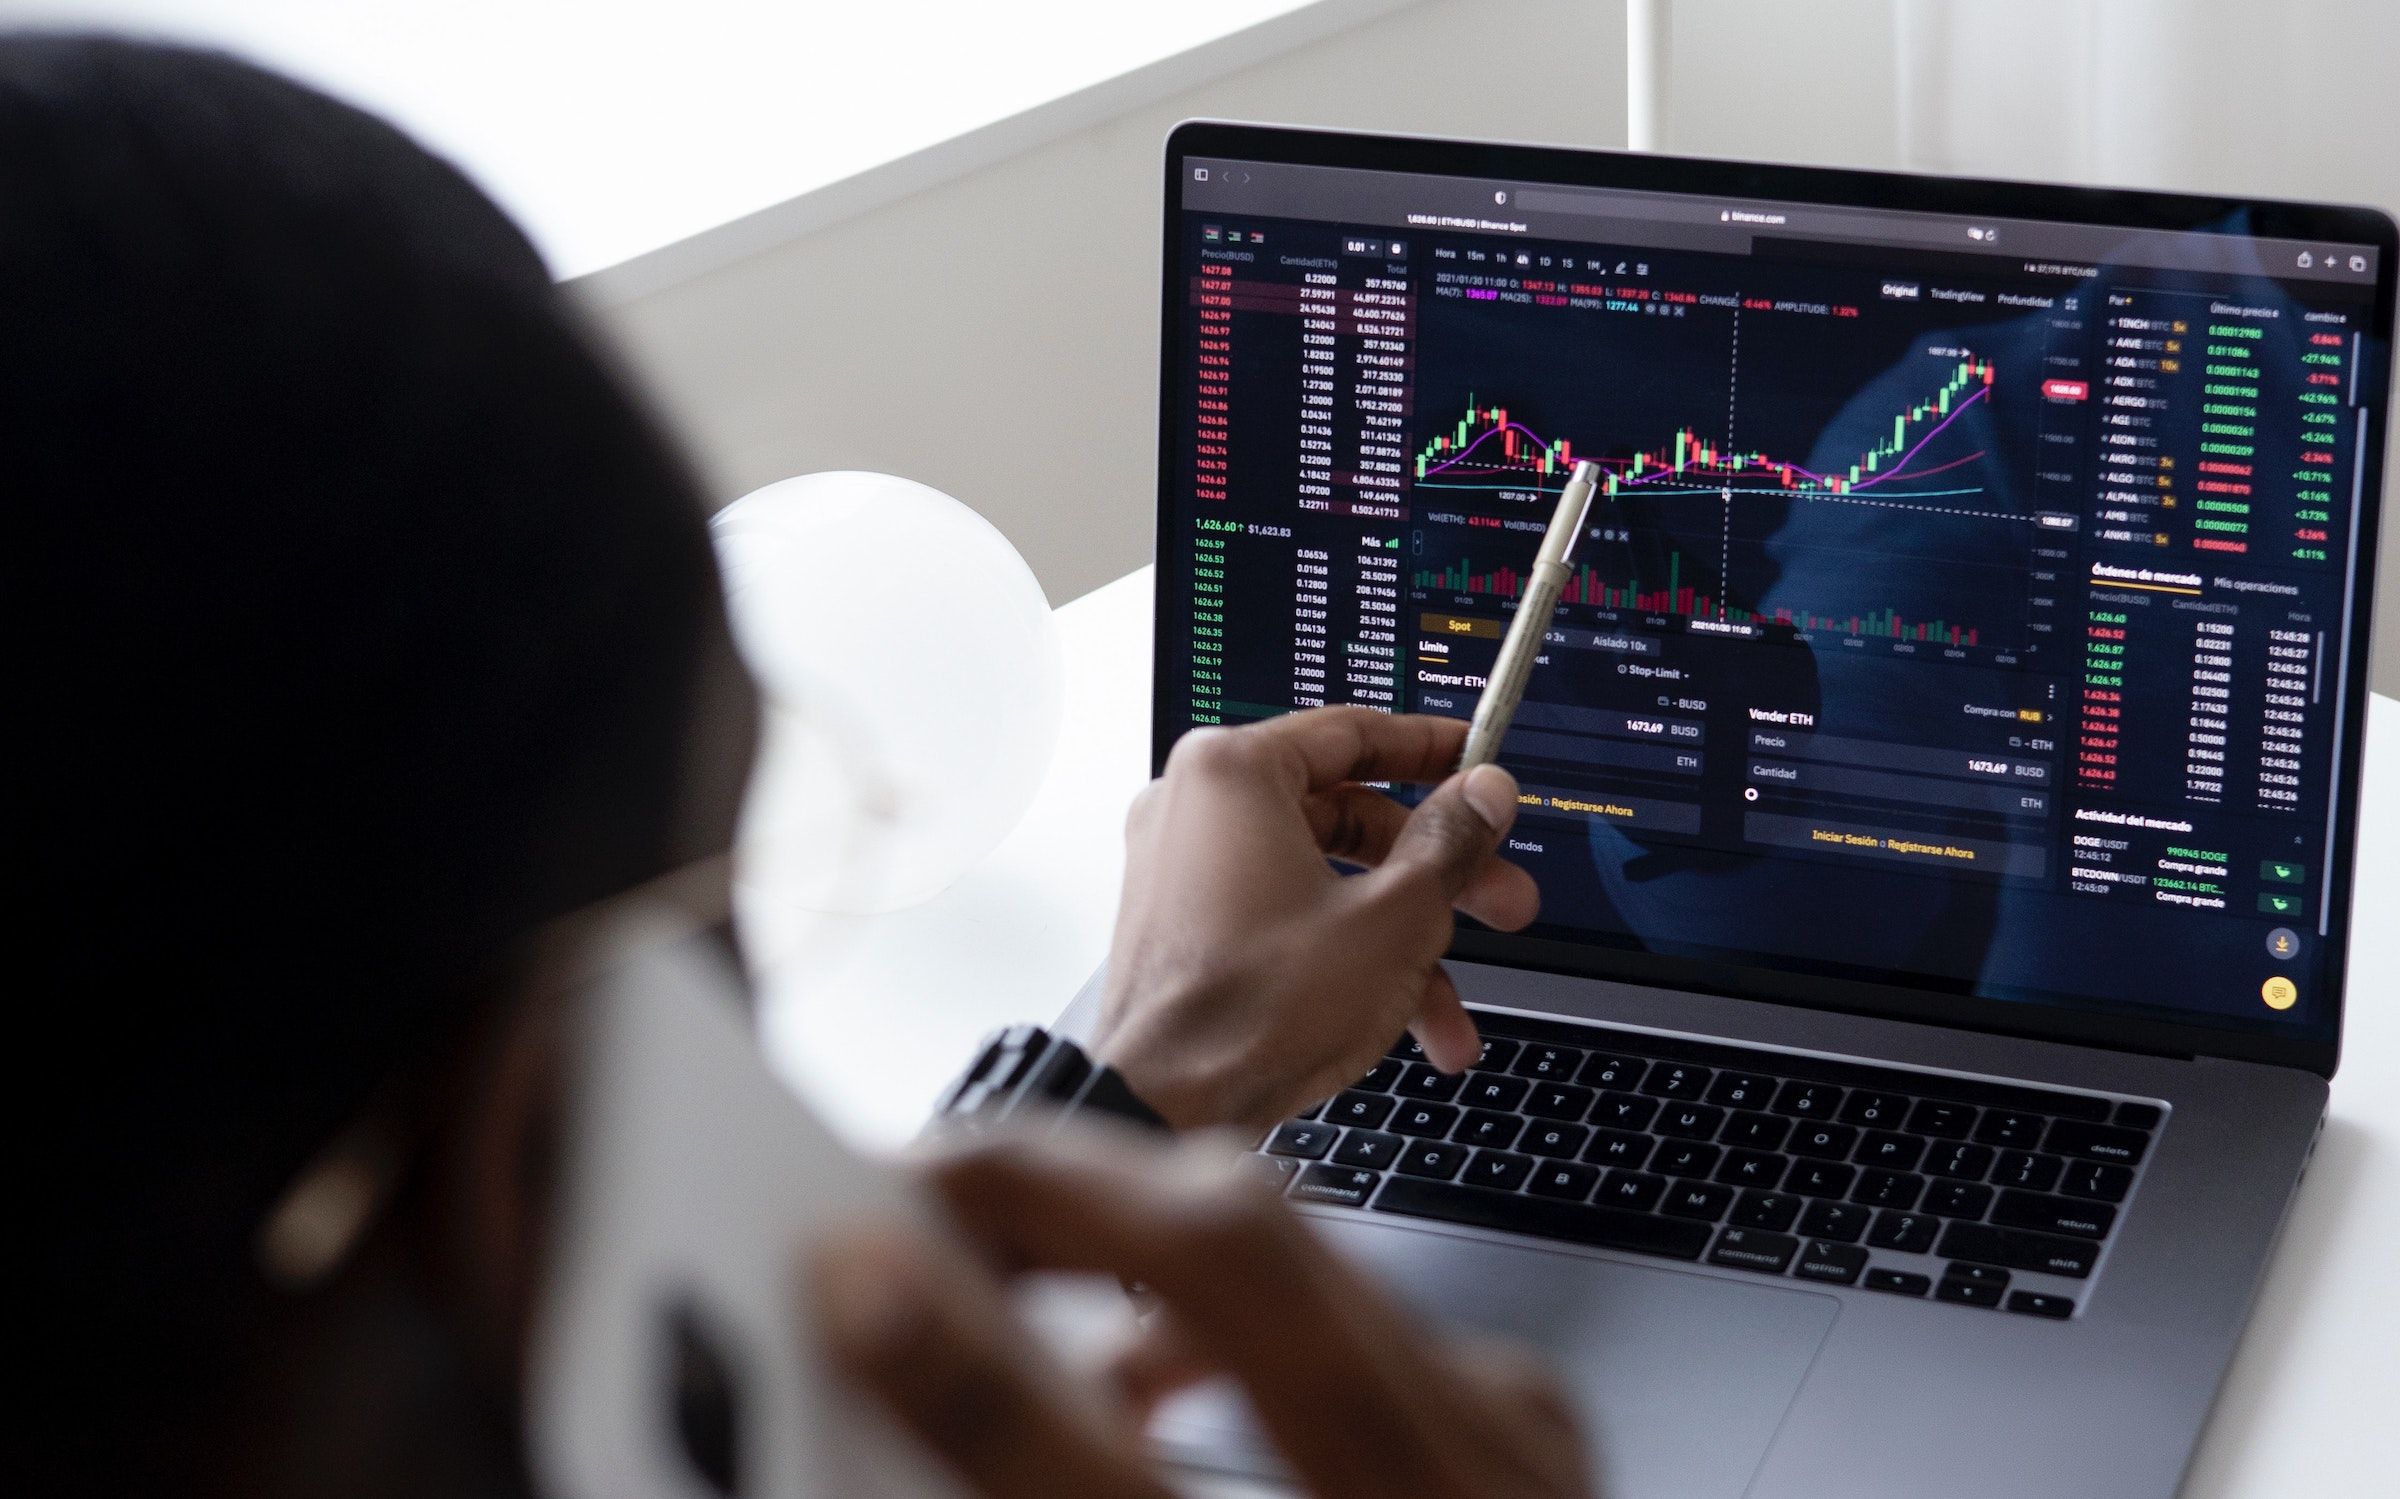 IoT analytics services company